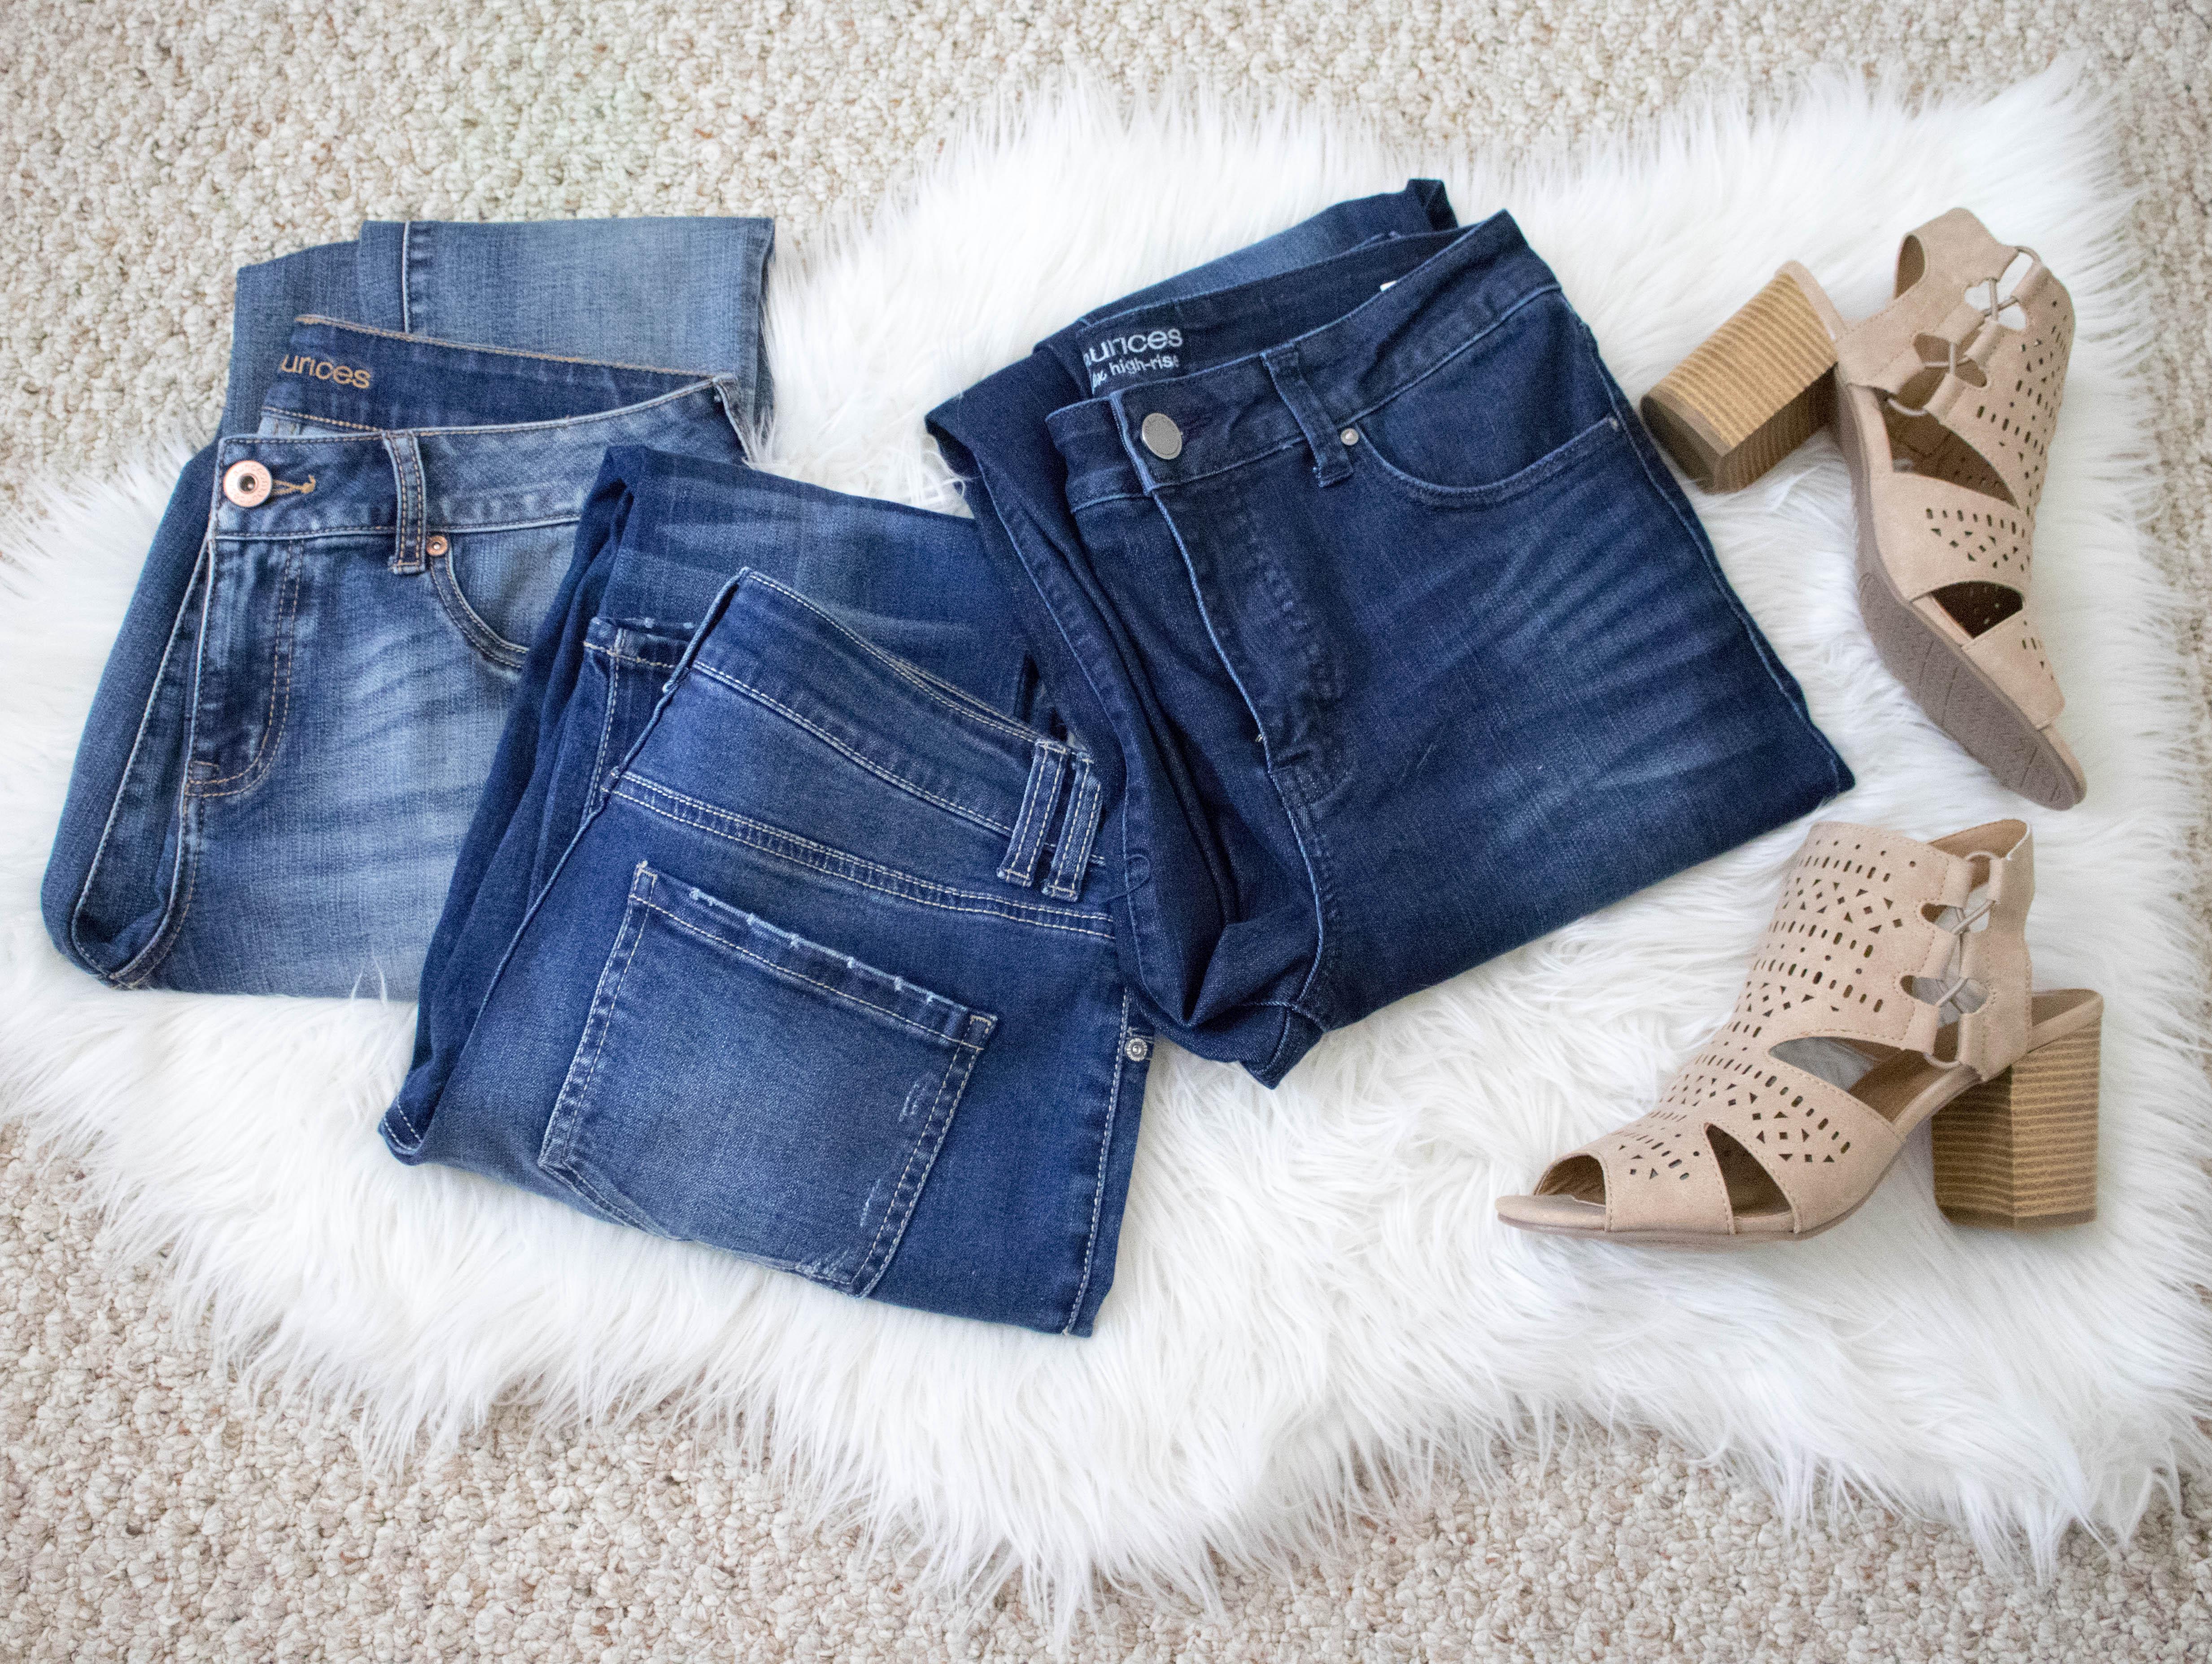 denim try on maurices #denim #jeans #skinnyjeans